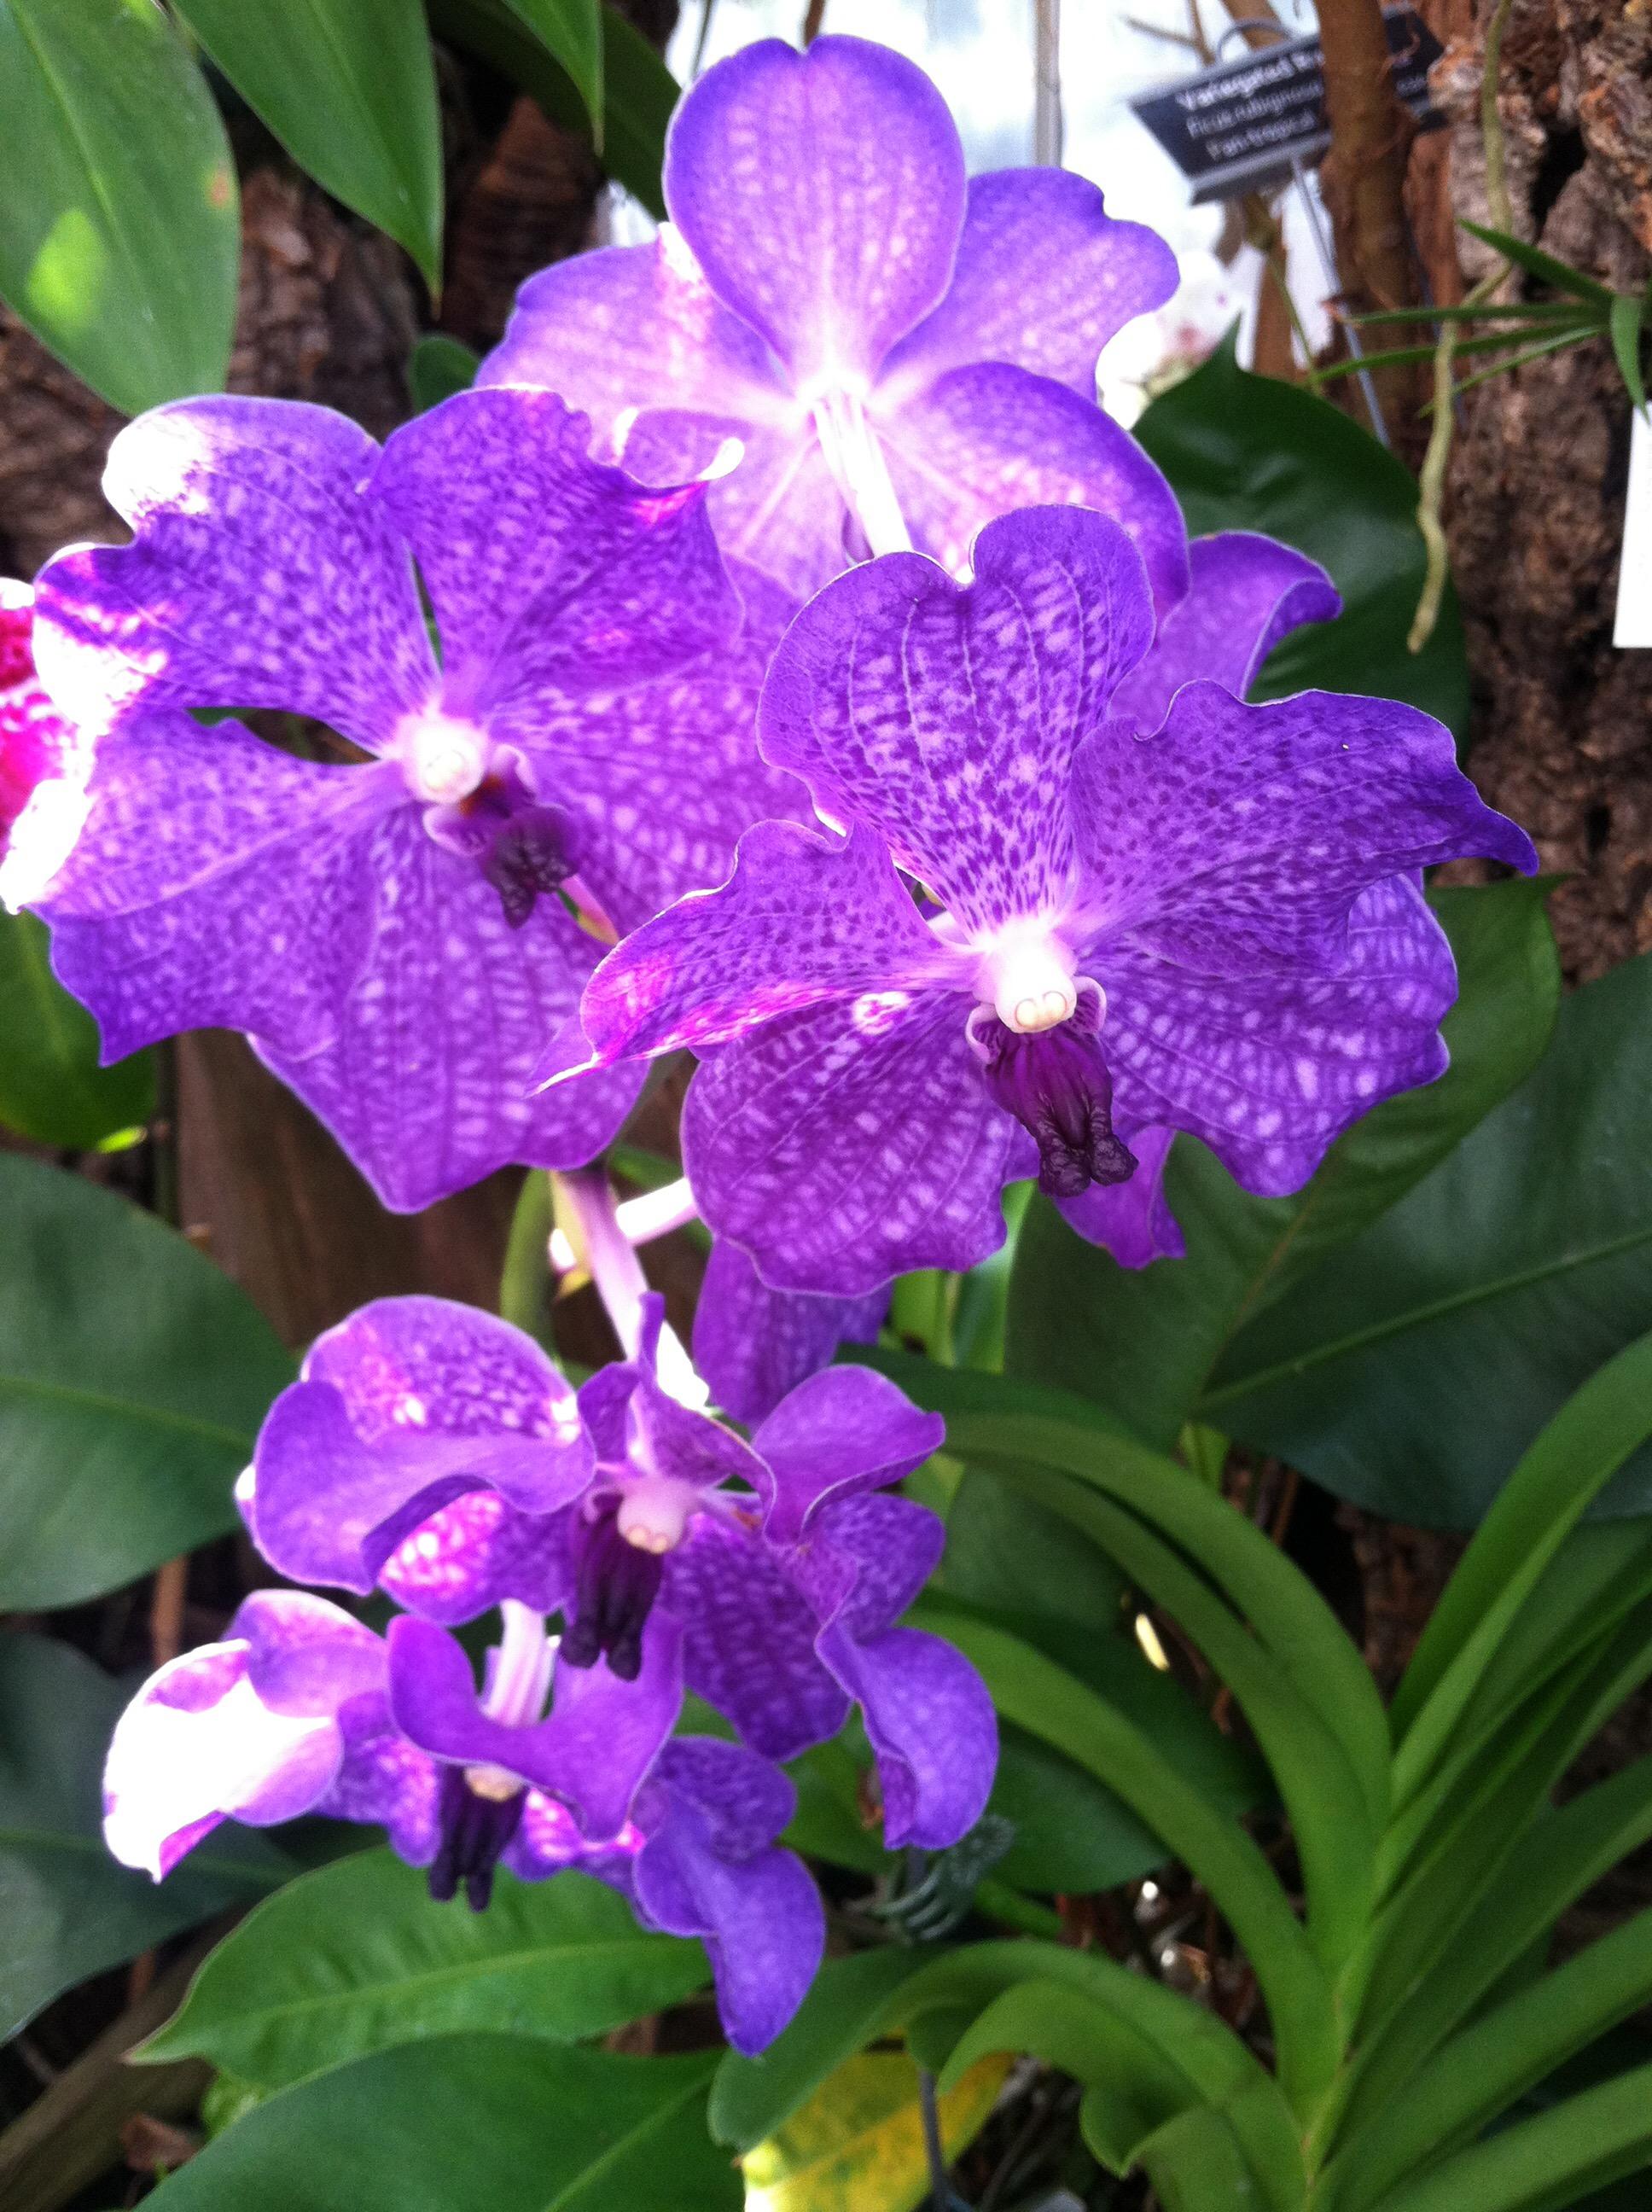 Strange Places: UNC Charlotte Botanical Gardens